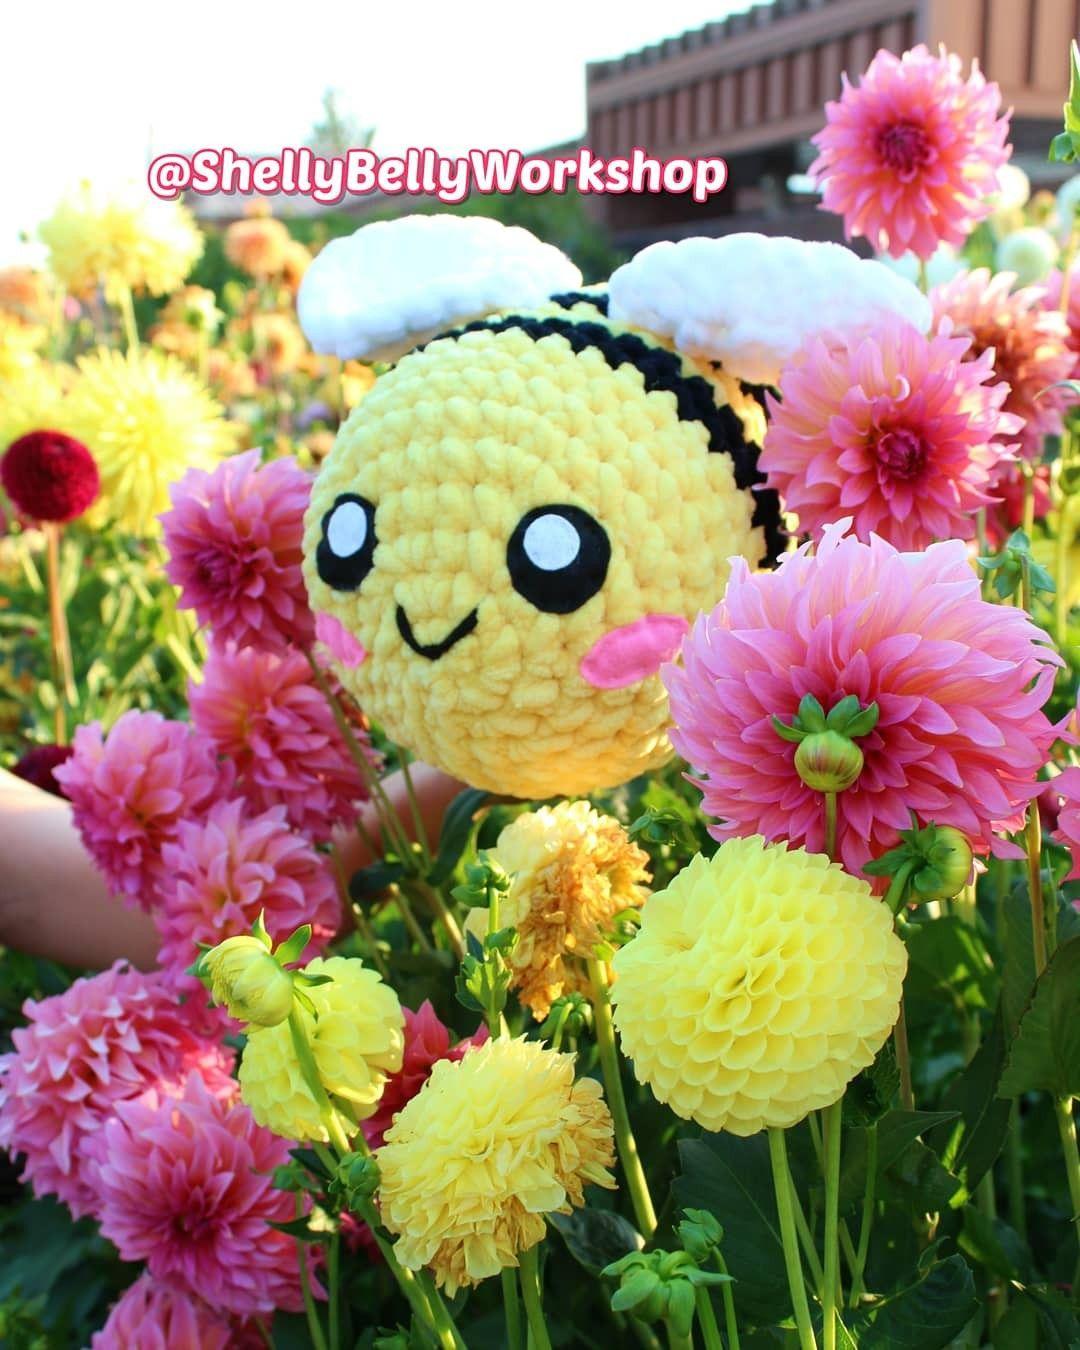 Big Crochet Bee Tiktok Plushie Shellybellyworkshop On Etsy Com Instagram Tiktok Crochet Bee Handmade Handmade Crochet